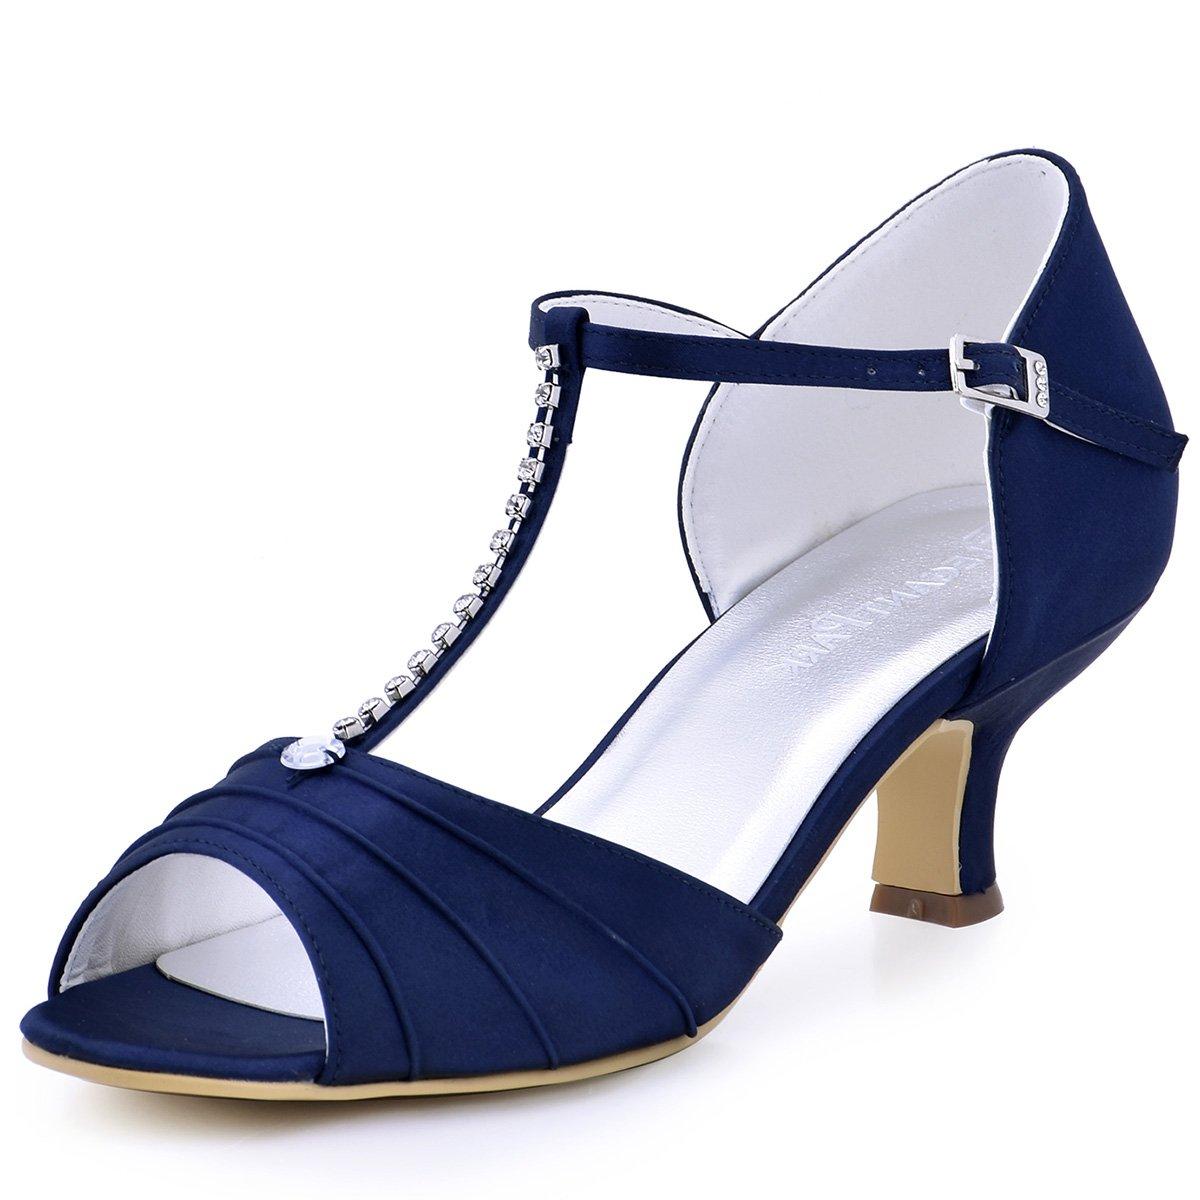 ElegantPark EL-035 Women Peep Toe T-Strap Pumps Mid Heel Rhinestones Satin Evening Wedding Bridal Sandals B01AFW6448 4 B(M) US (true fitting 5 US)|Navy Blue